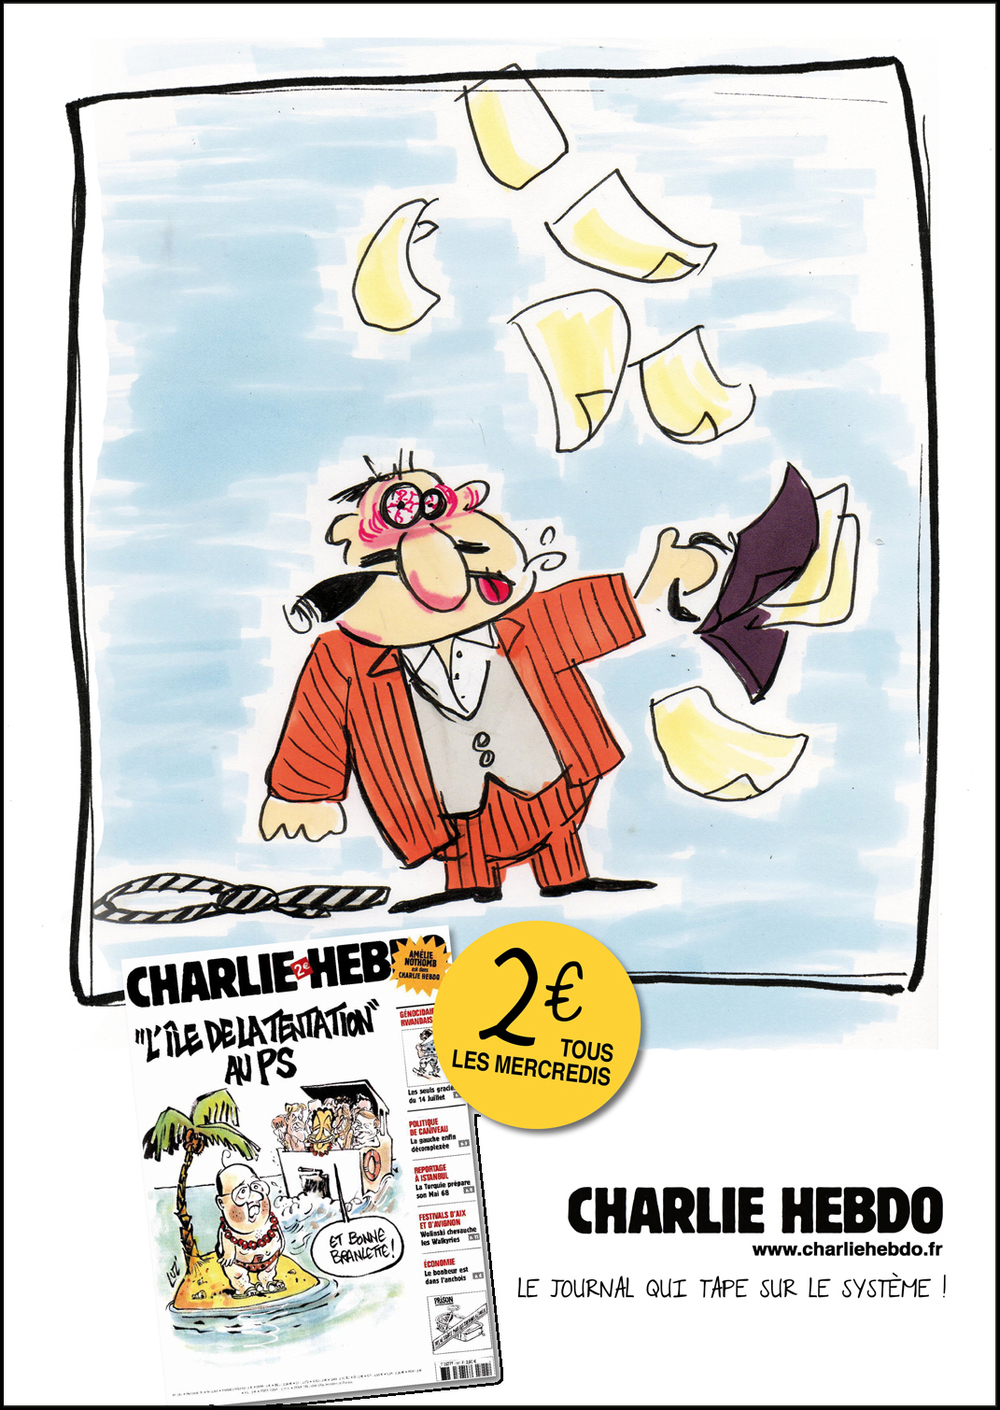 charlie-hebdo-homme-daffaires-da-lily-la-fronde-redac-simon-erault.jpg